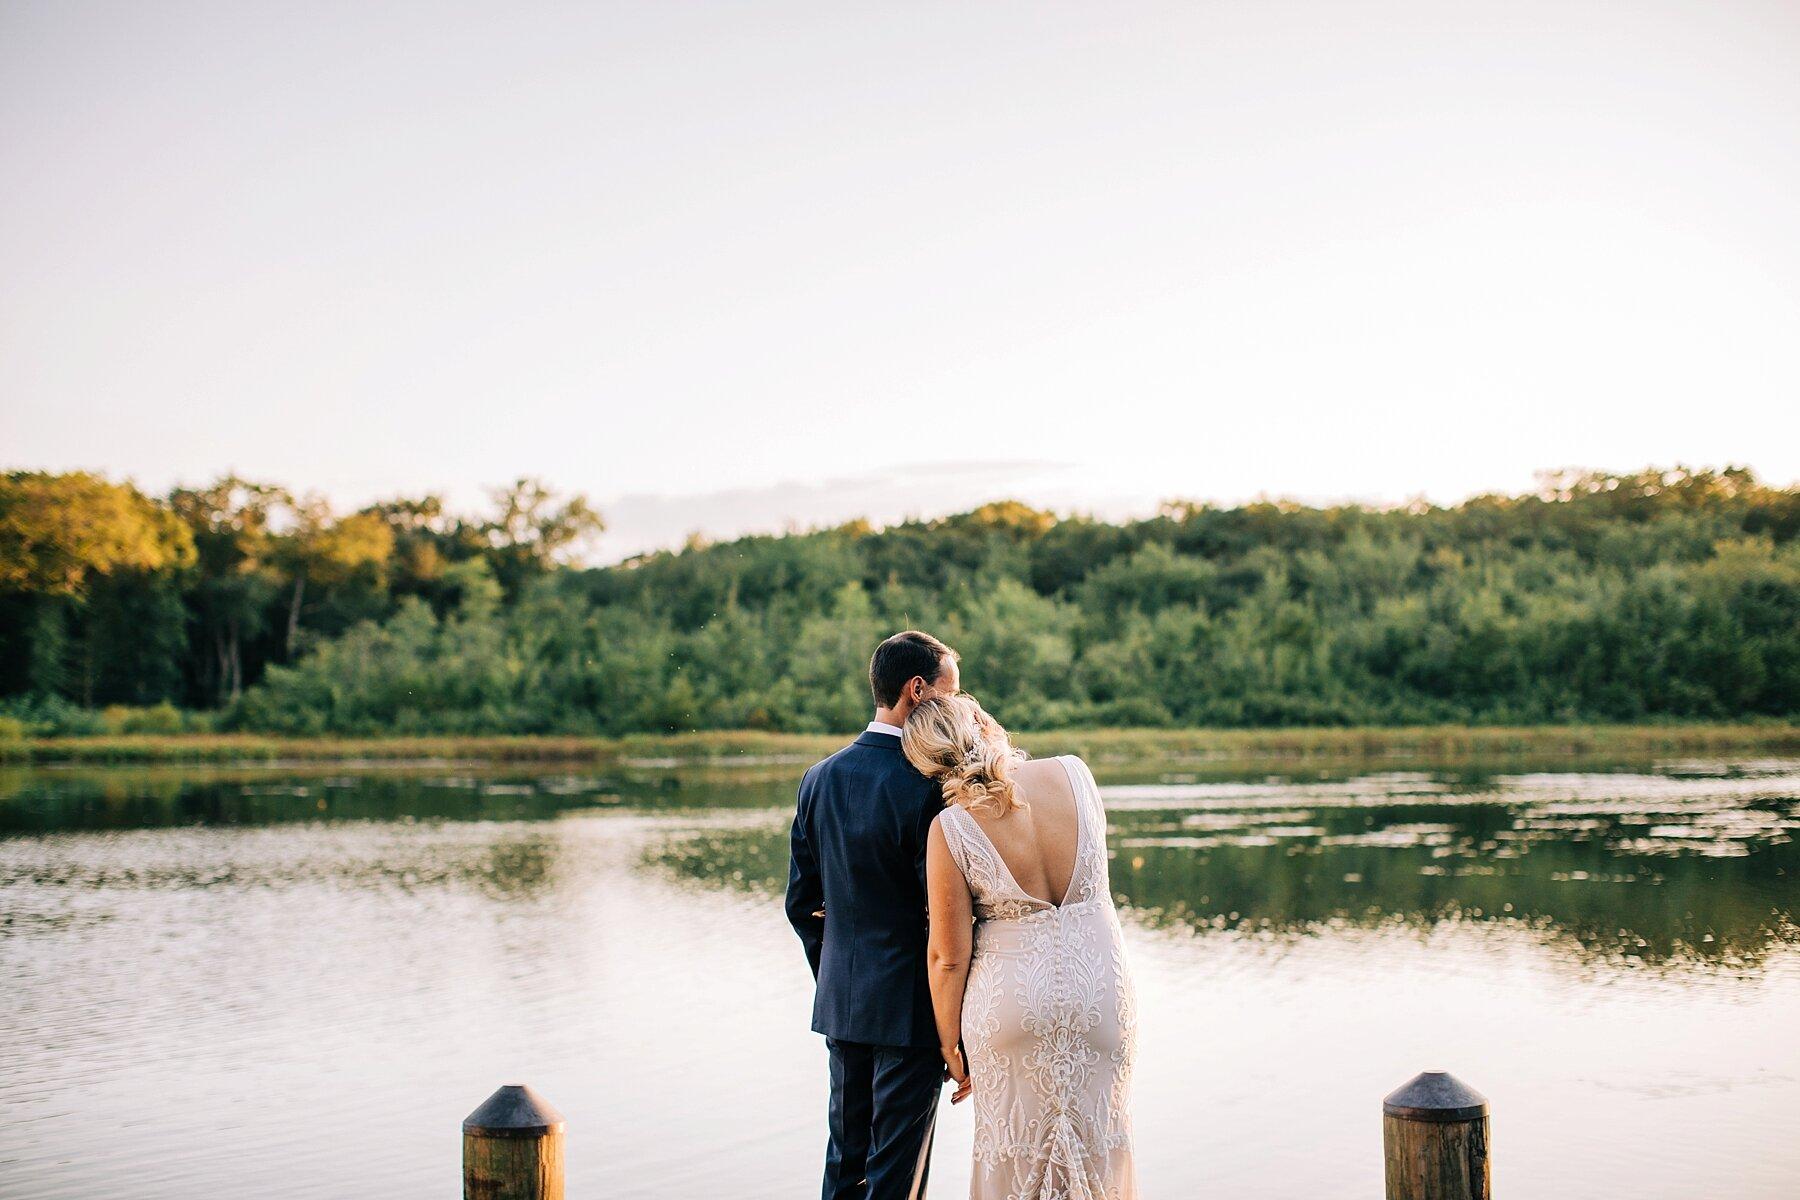 the-mill-lakeside-manor-spring-lake-wedding-photographer_0038.jpg